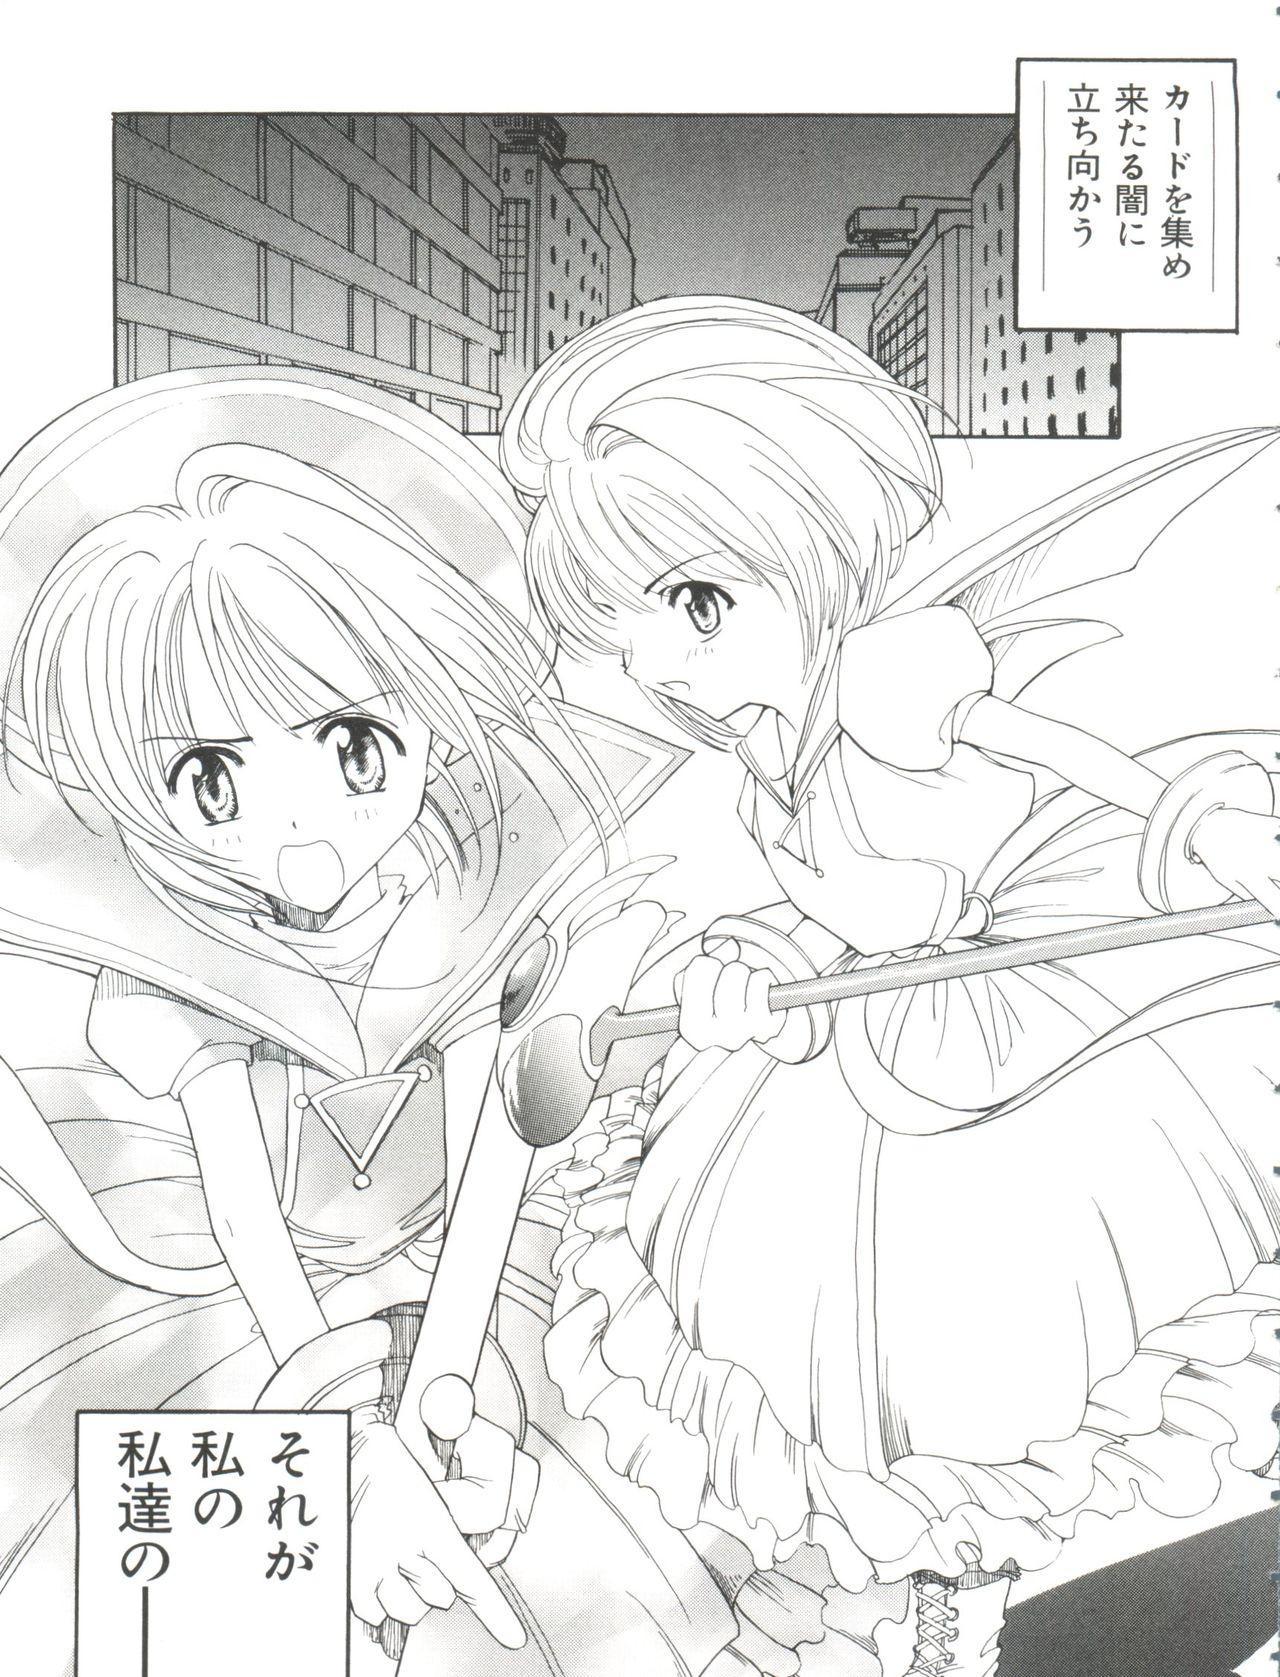 Ero-chan to Issho 62